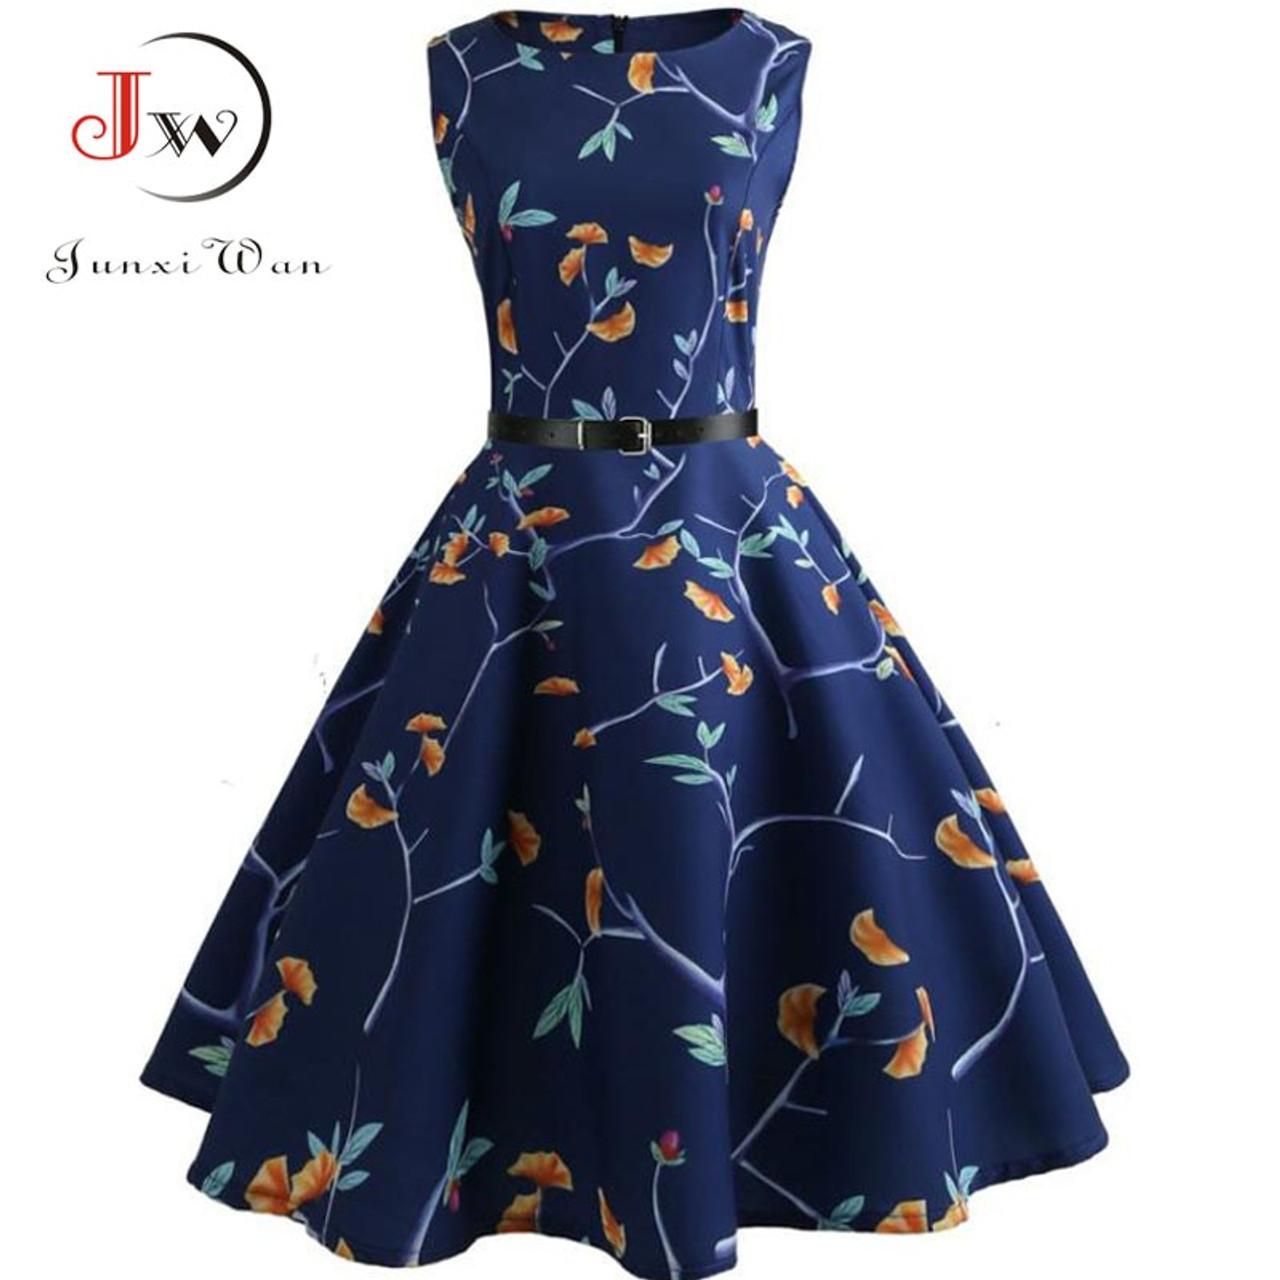 1c694f2d53094 Floral Print Summer Dress Women 2018 Vintage Elegant Swing Rockabilly Party  Dresses Plus Size Casual Midi Tunic Runway Dress